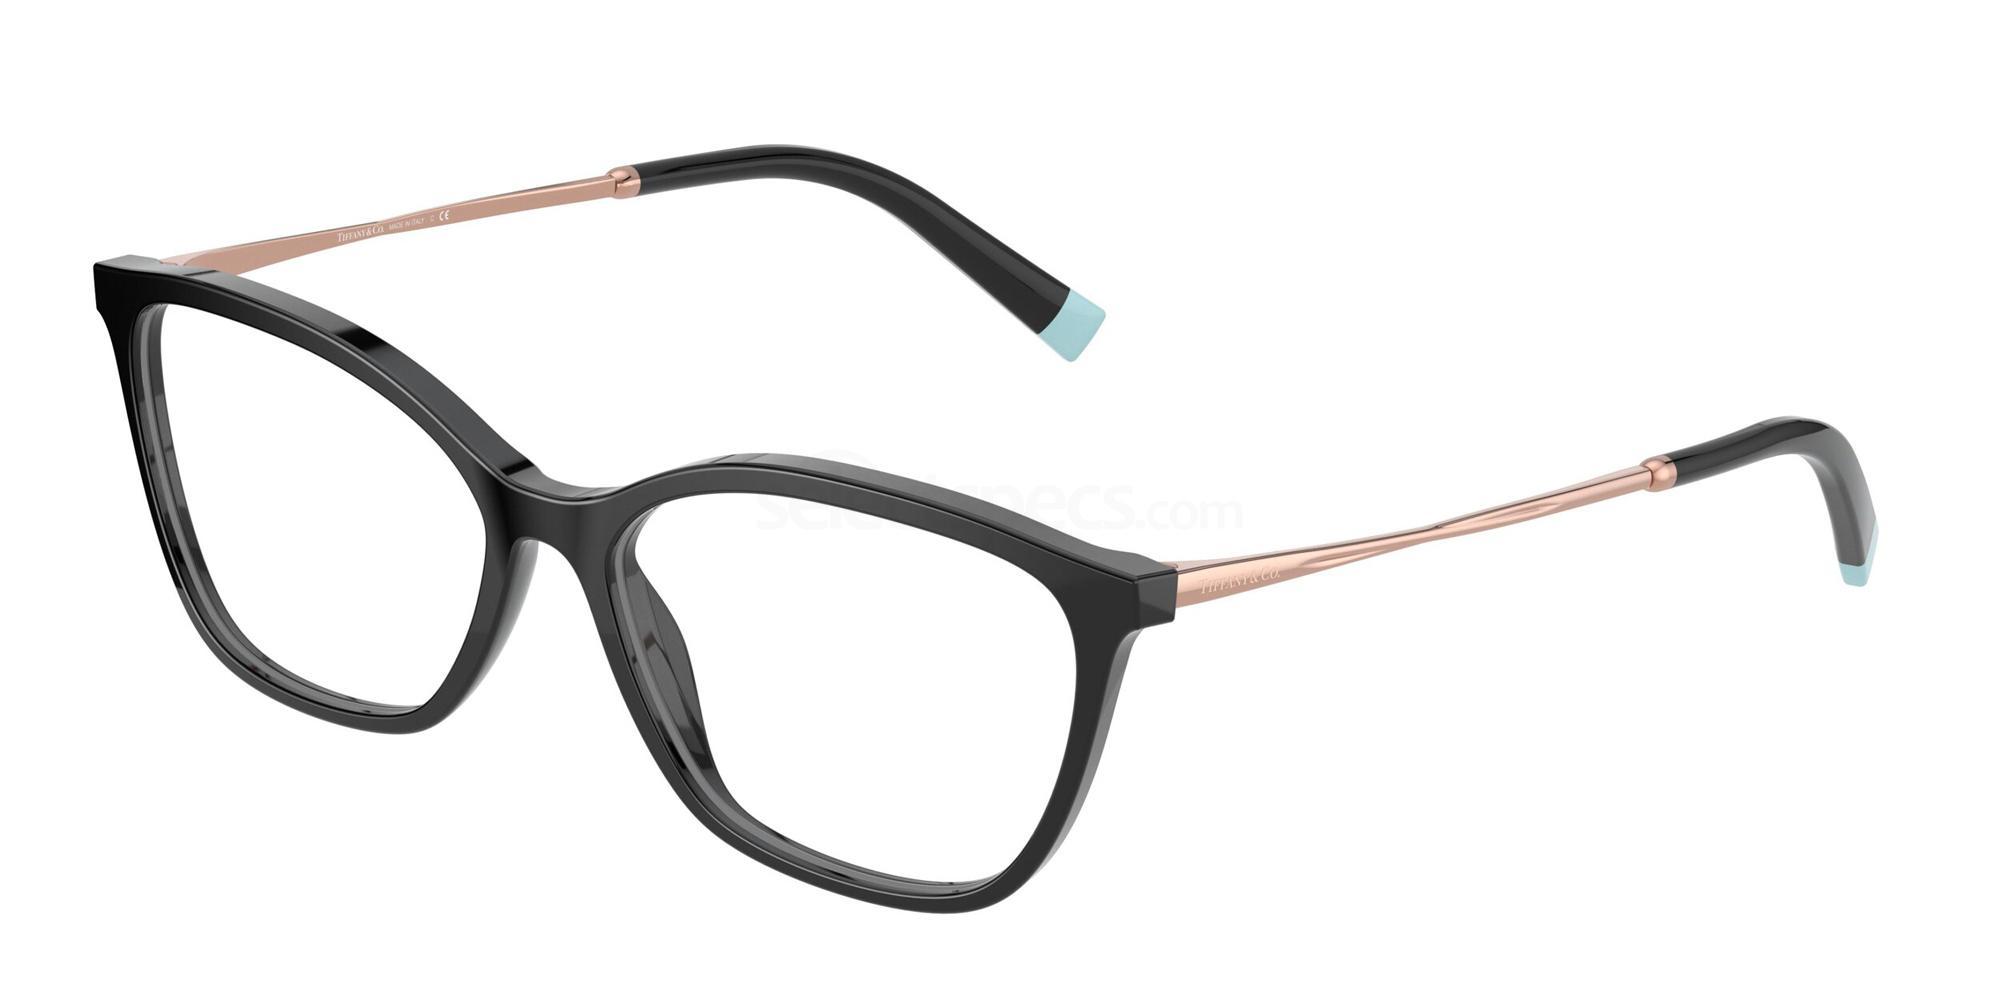 8001 TF2205 Glasses, Tiffany & Co.